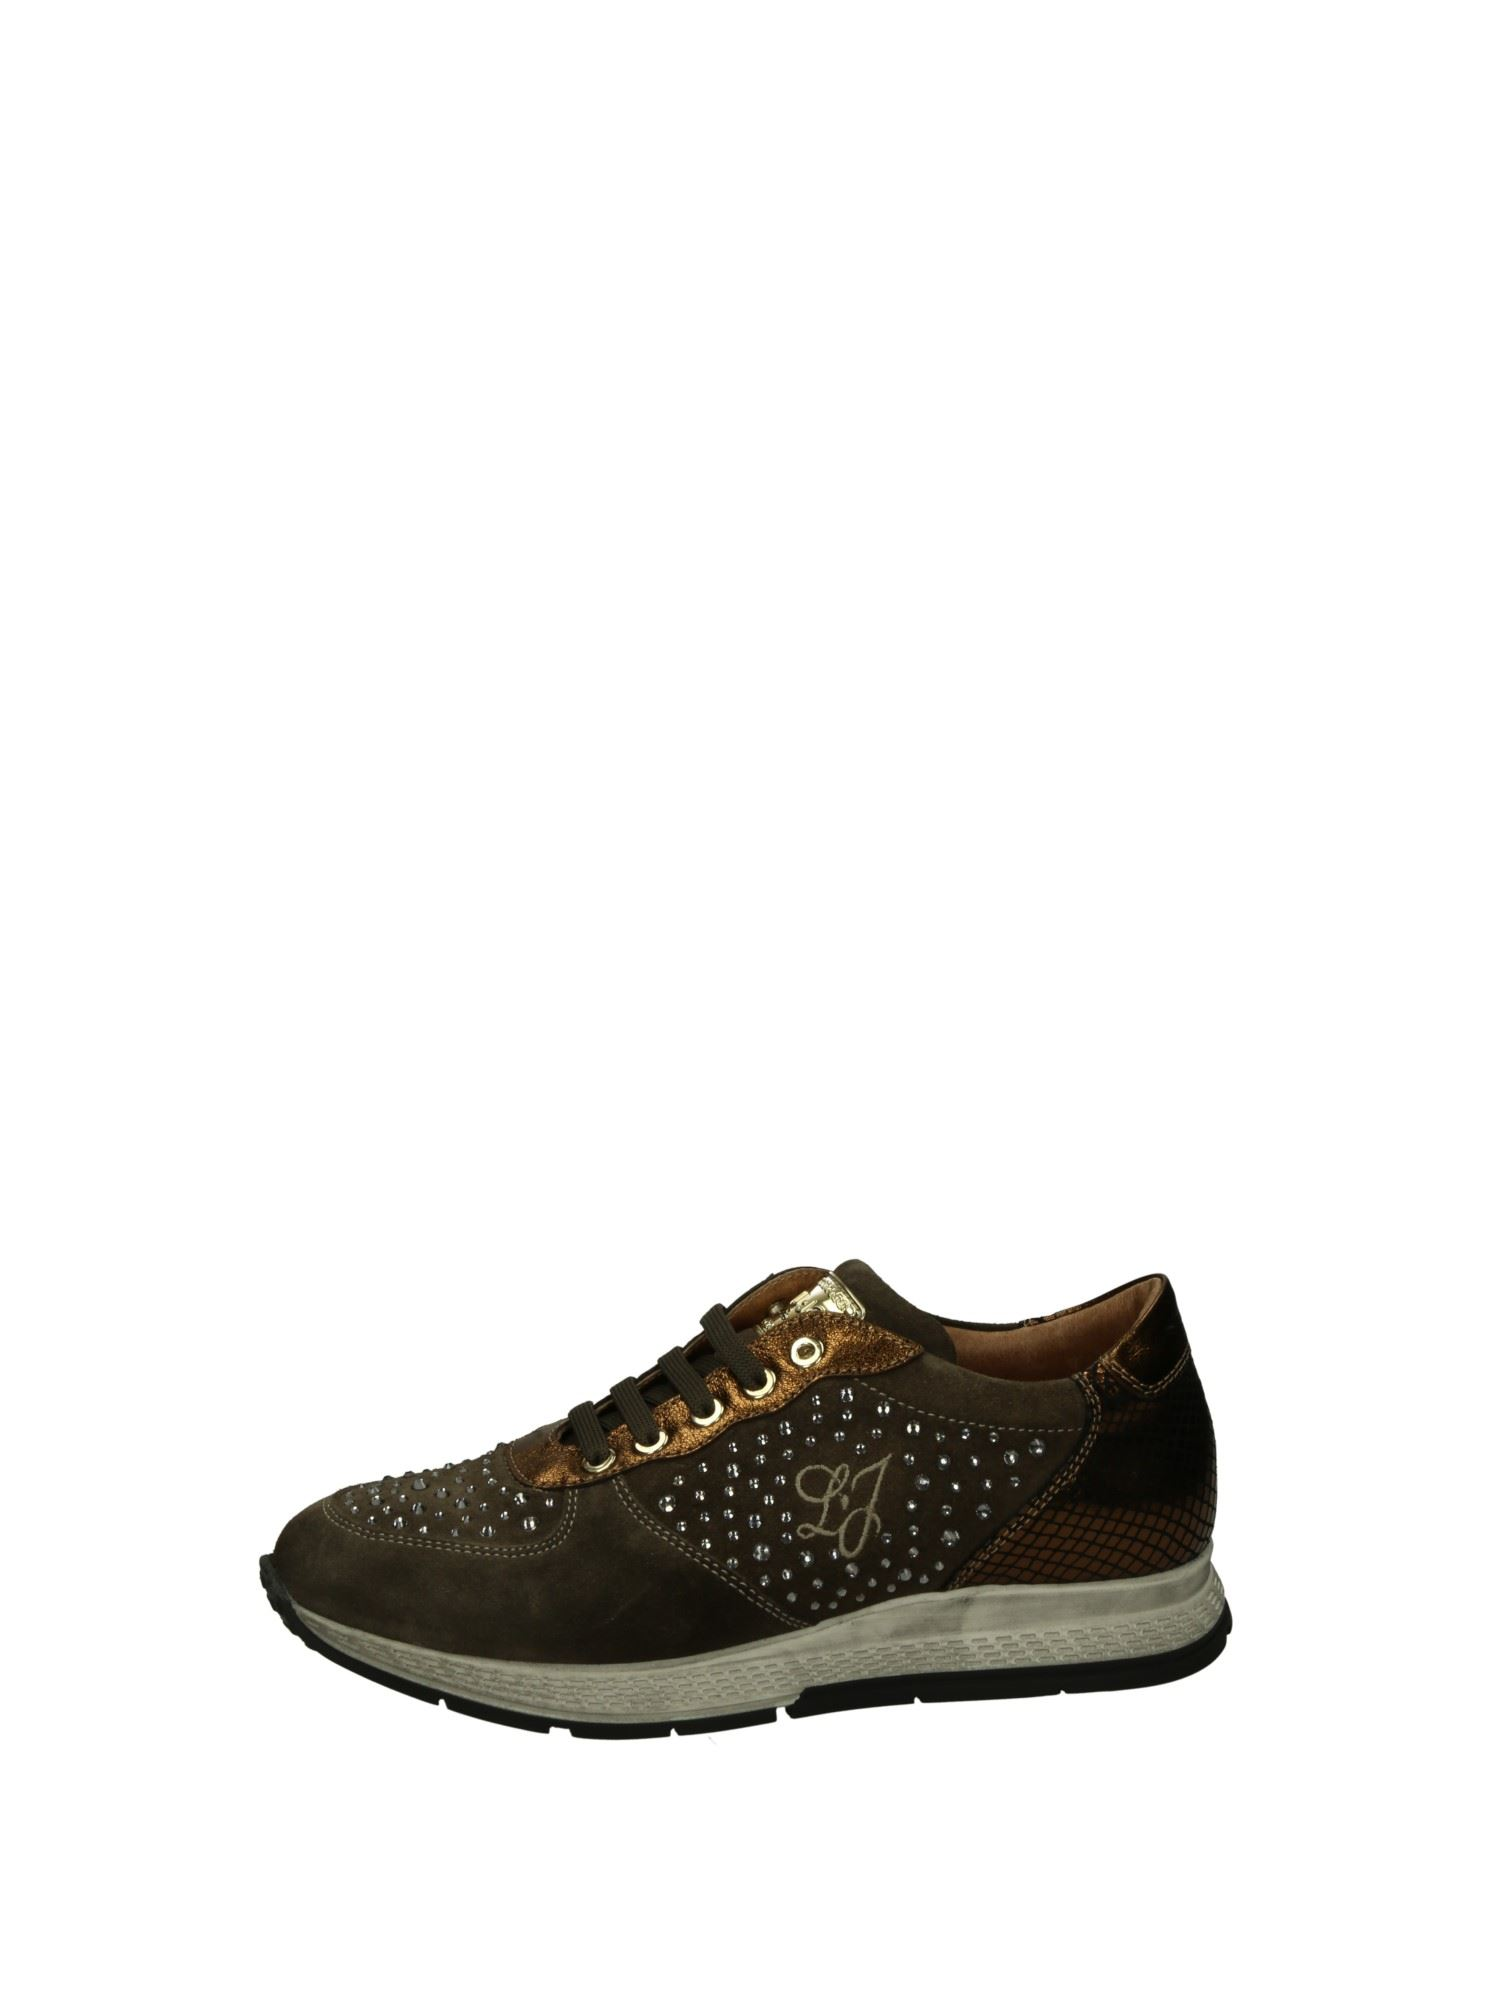 Sneakers-Basse-Donna-Liu-Jo-Girl-UB21674B-Autunno-Inverno